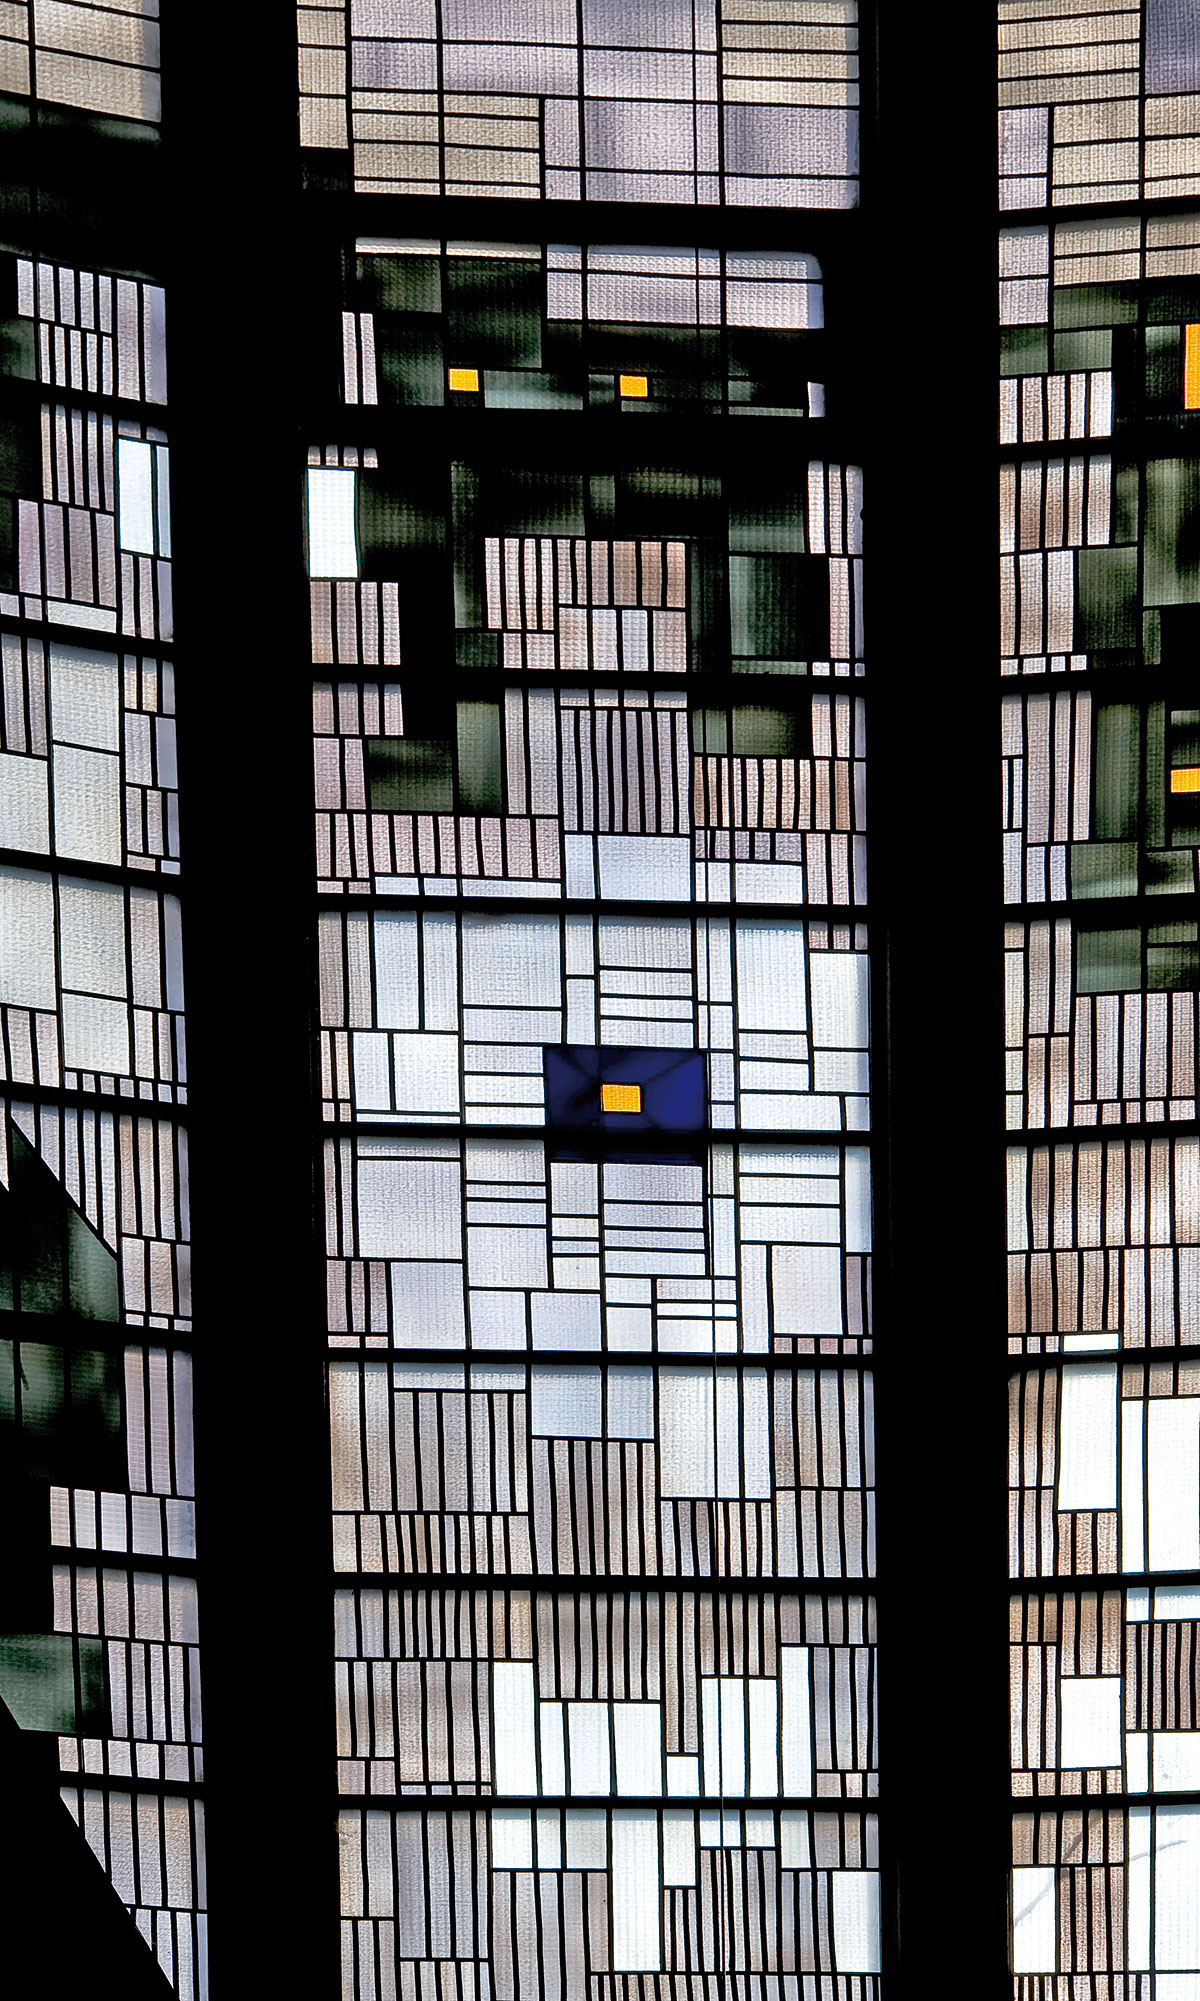 Saarbrücken | Maria Königin | Glasgestaltung | Foto: Marco Kany